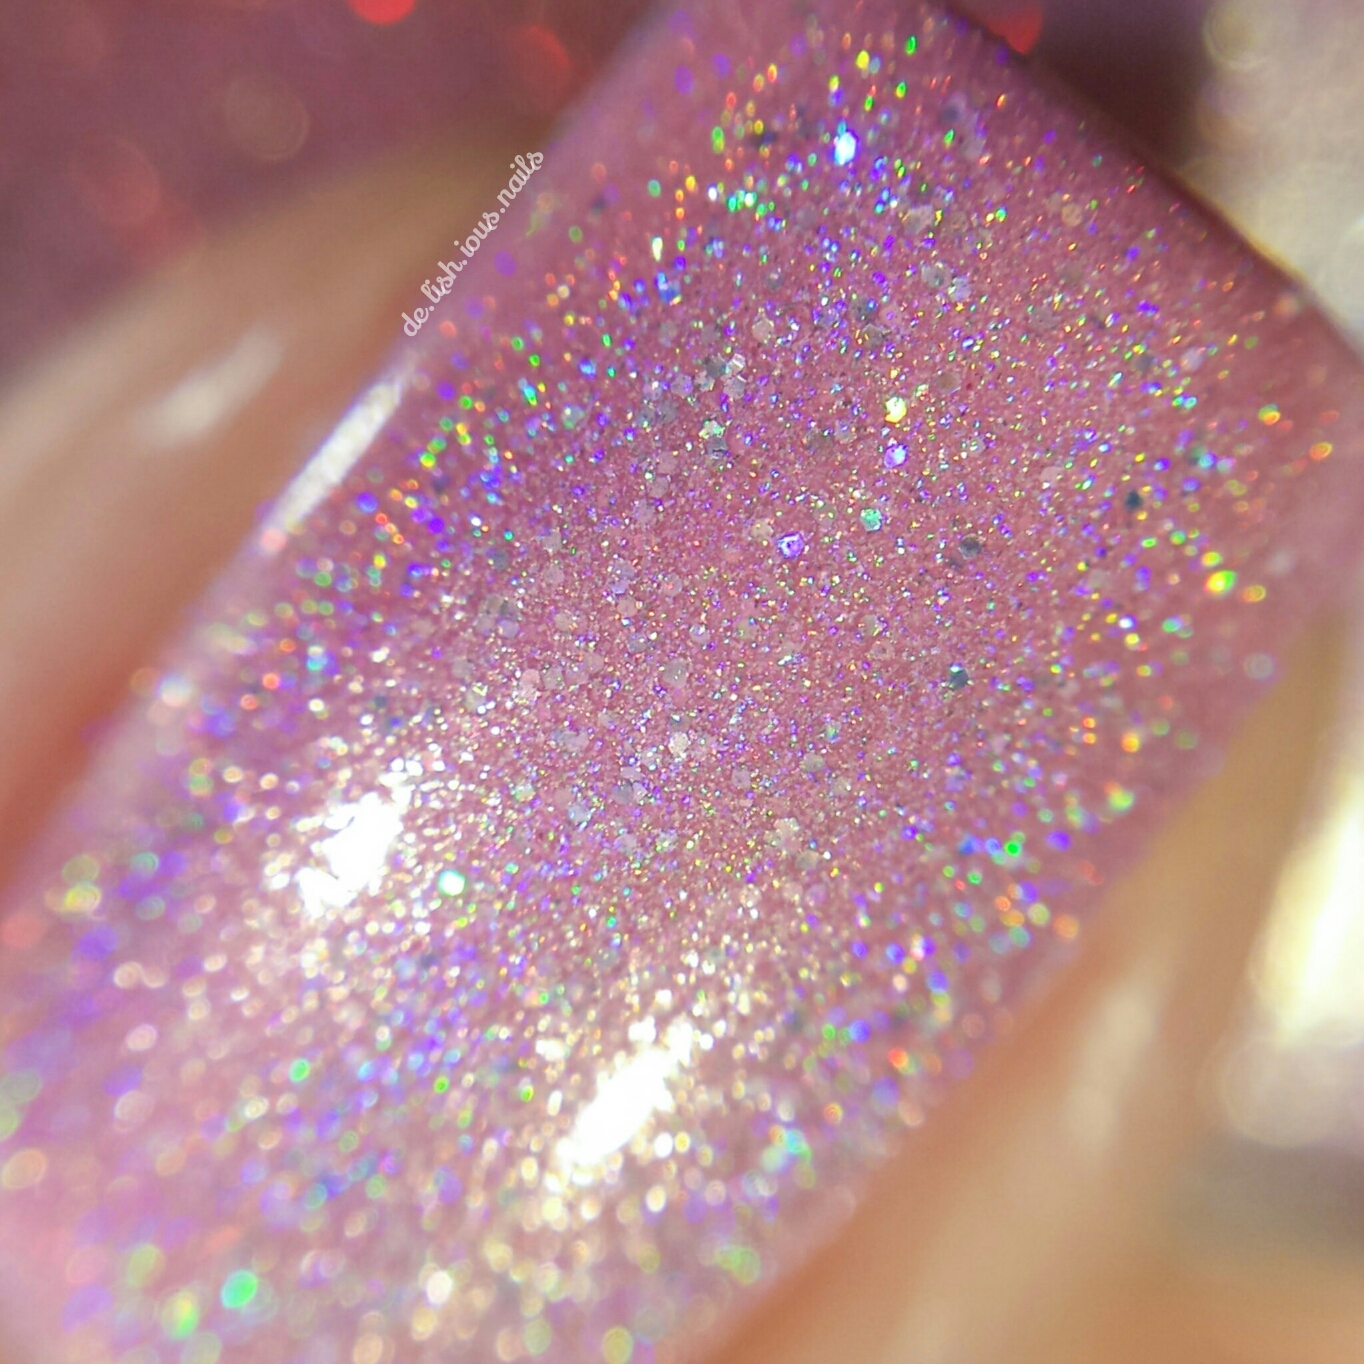 Glam_polish_king_Always_on_my_mind_3